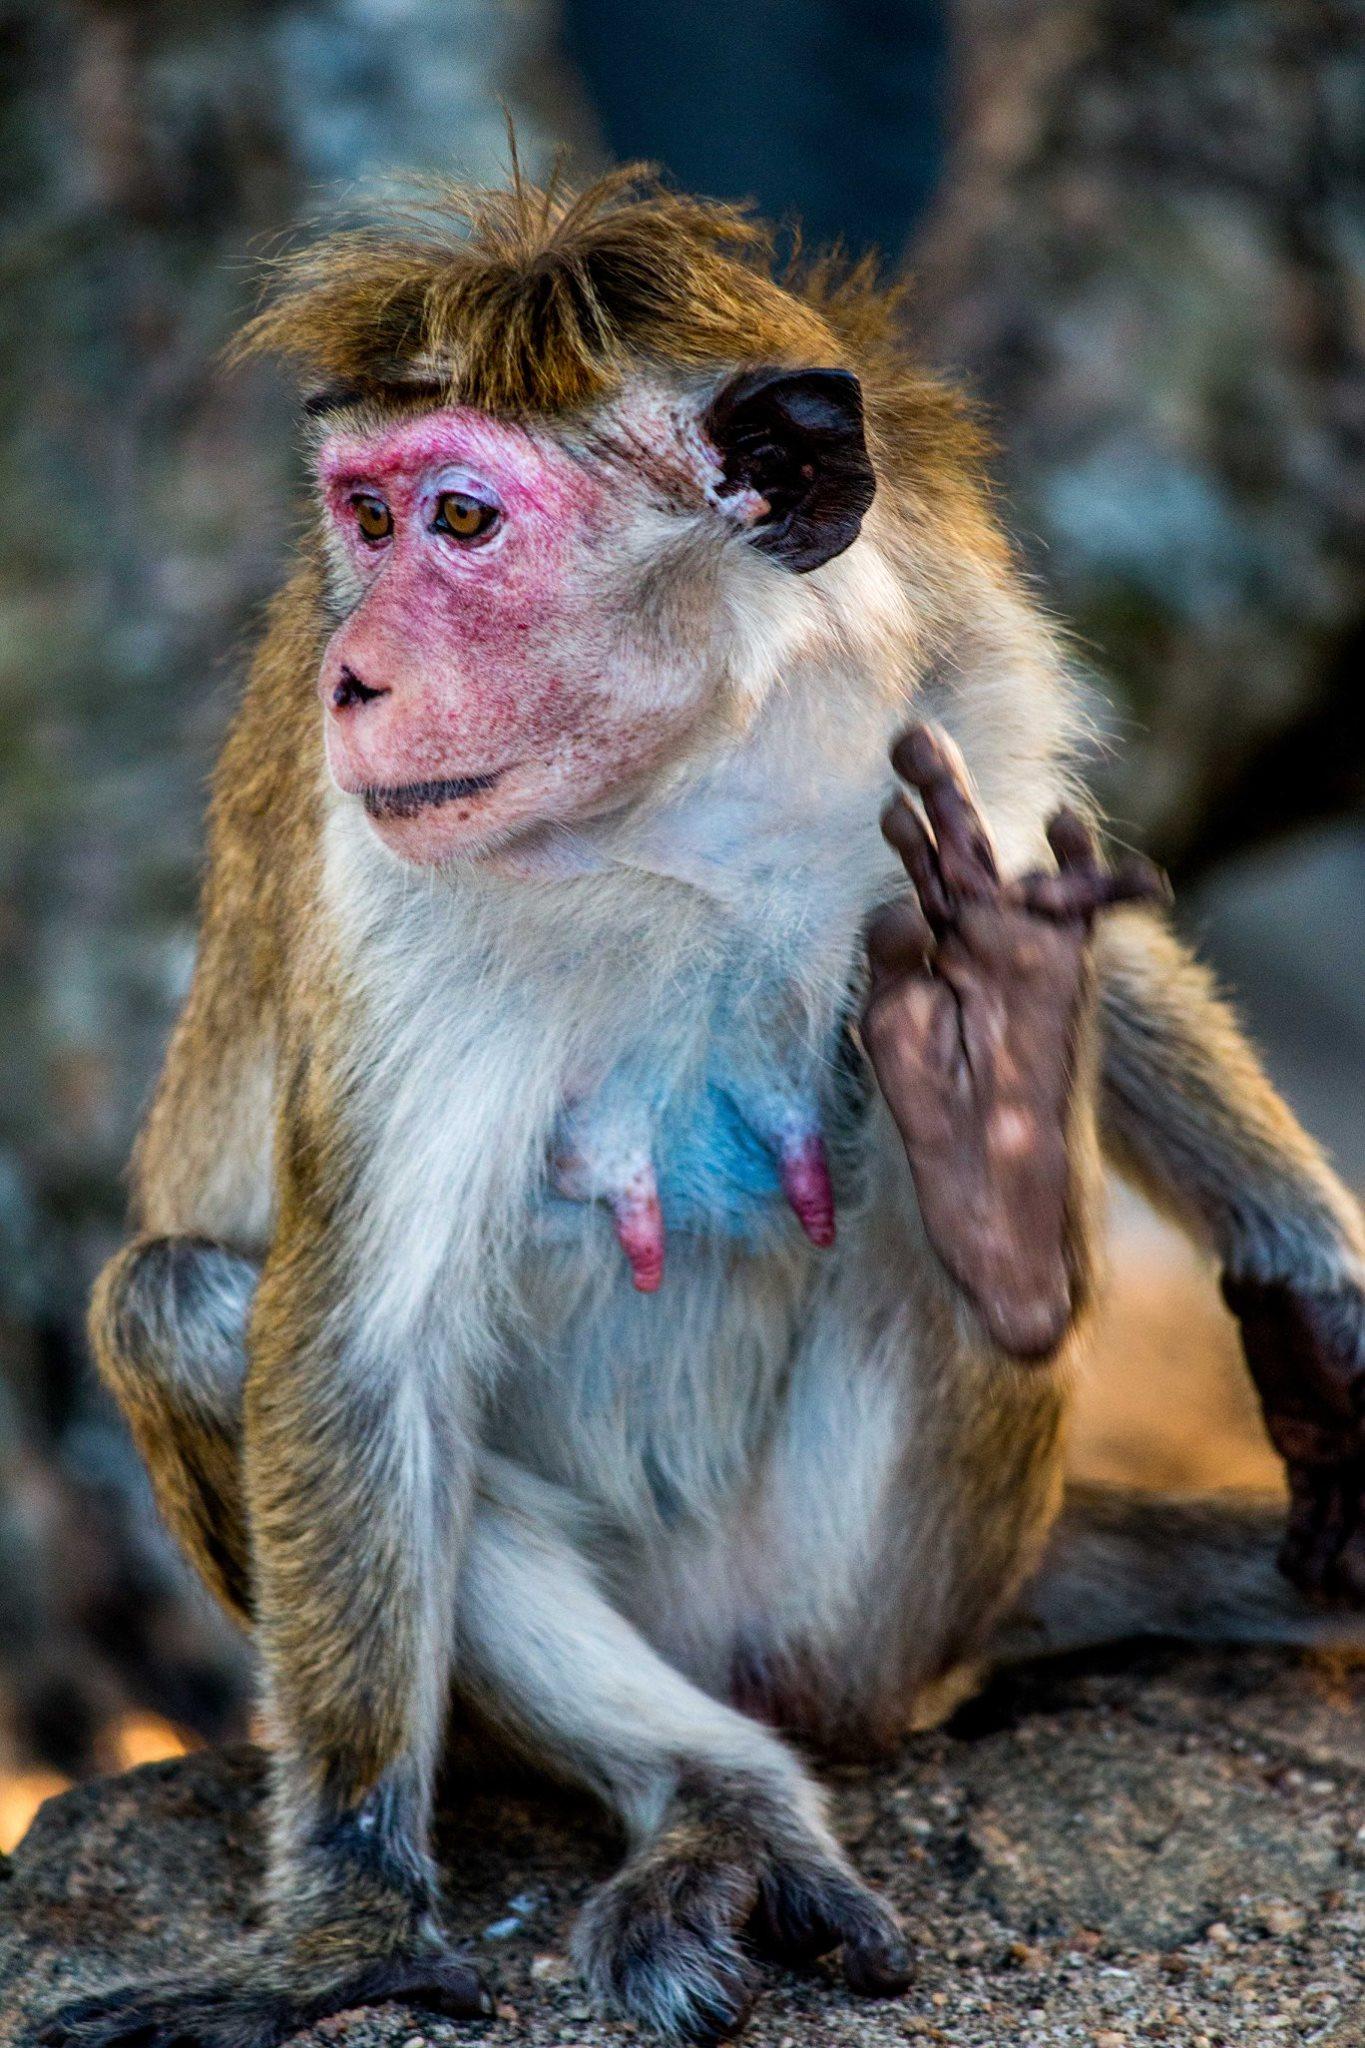 invite-to-paradise-sri-lanka-and-maldives-specialists-travel-agent-tour-operator-customer-review-feedback-joel-rhian-monkey-3.jpg